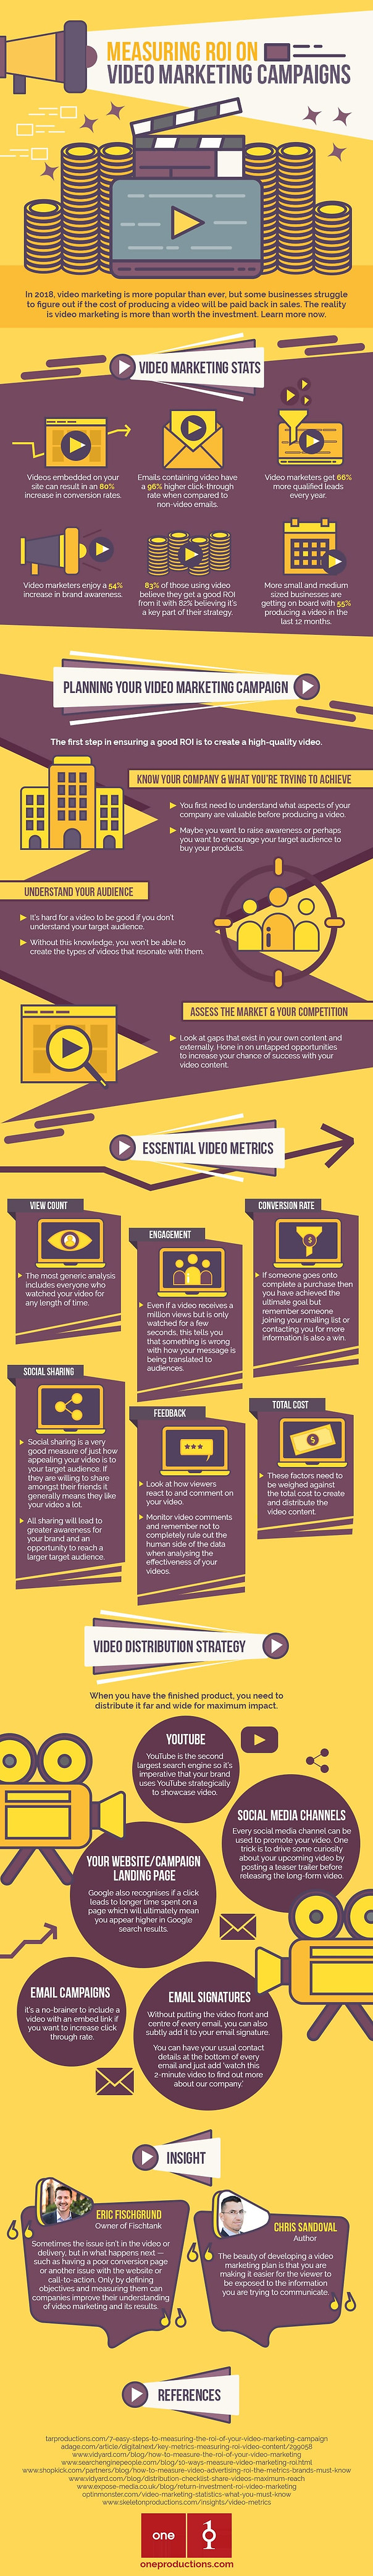 measuring-roi-on-video-marketing-campaig